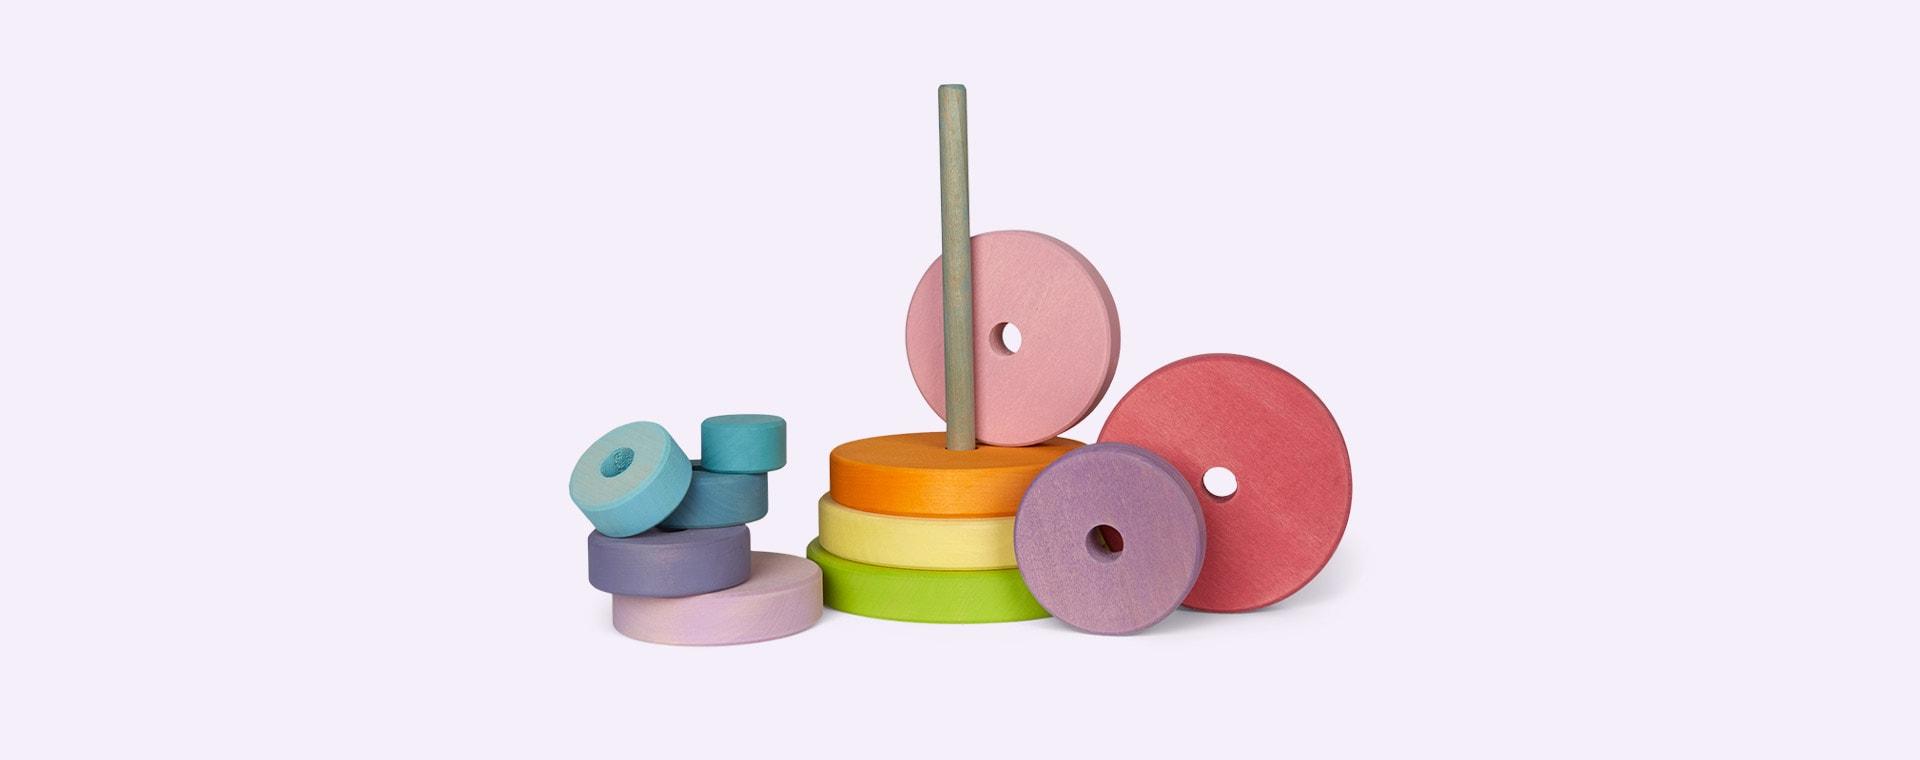 Multi Grimm's Pastel Stacking Toy